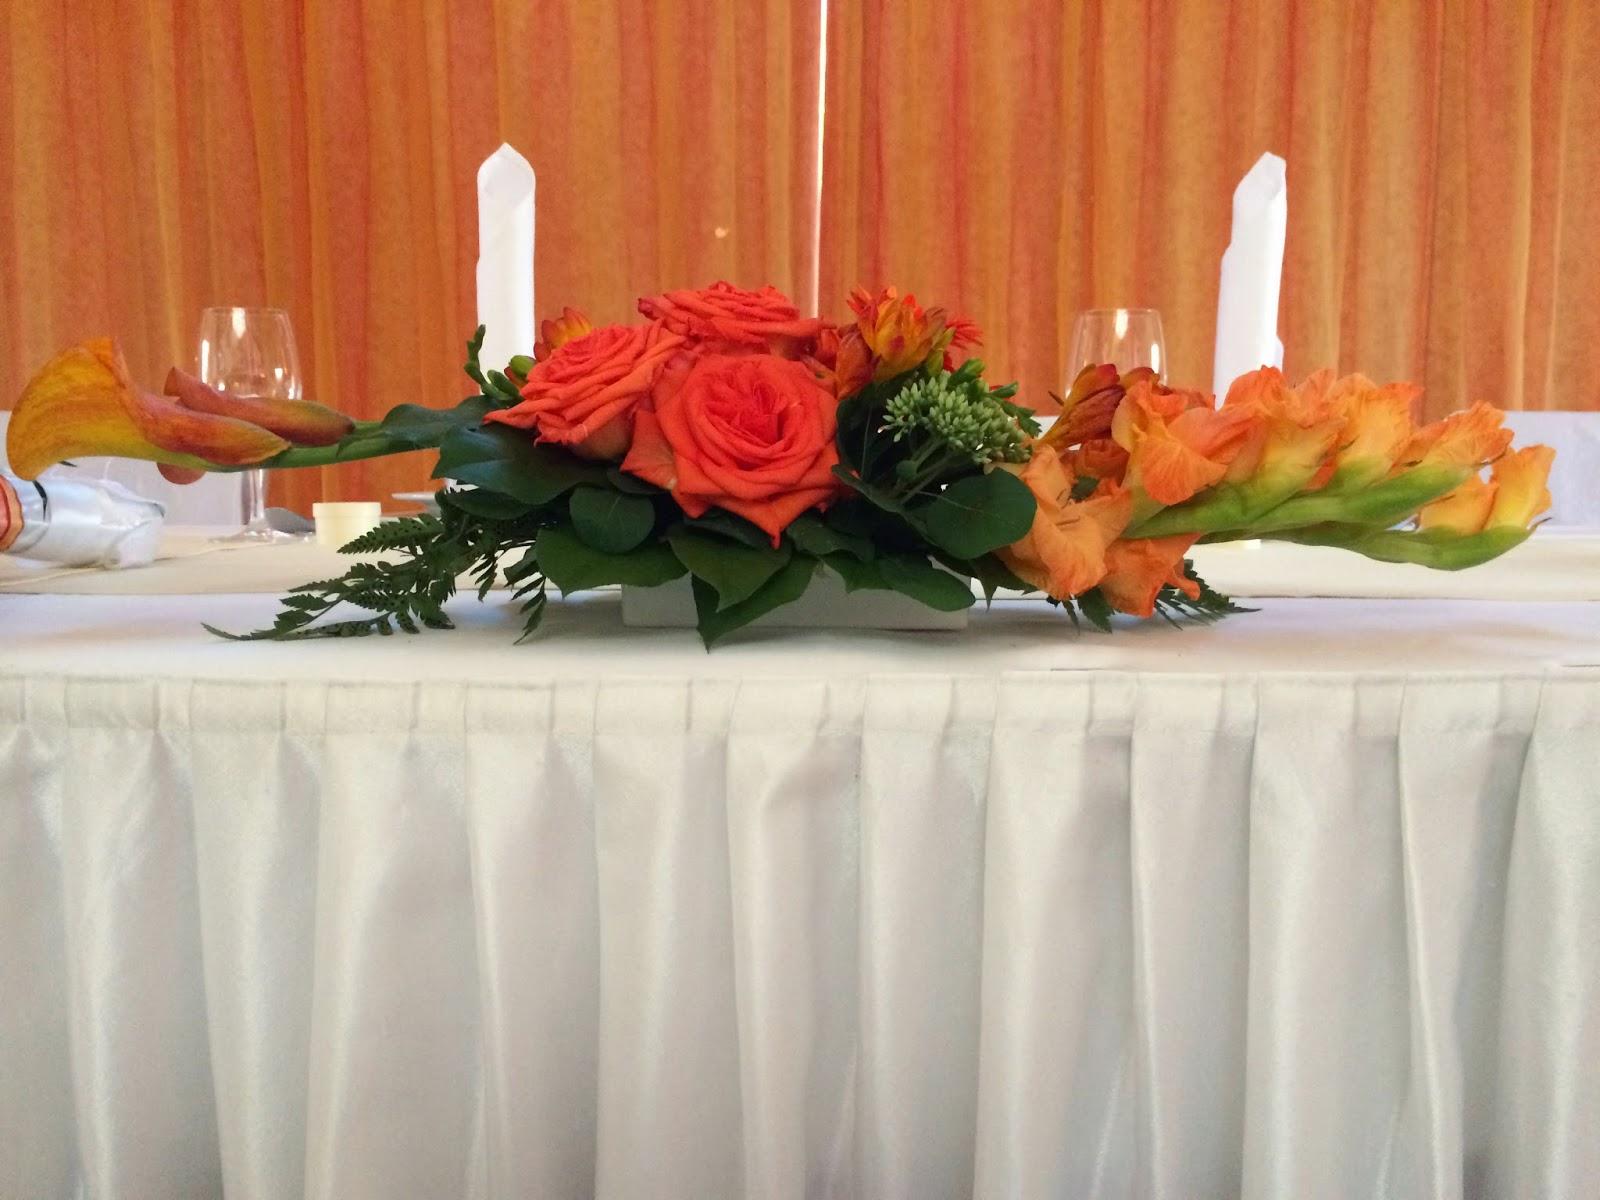 Asztaldekor